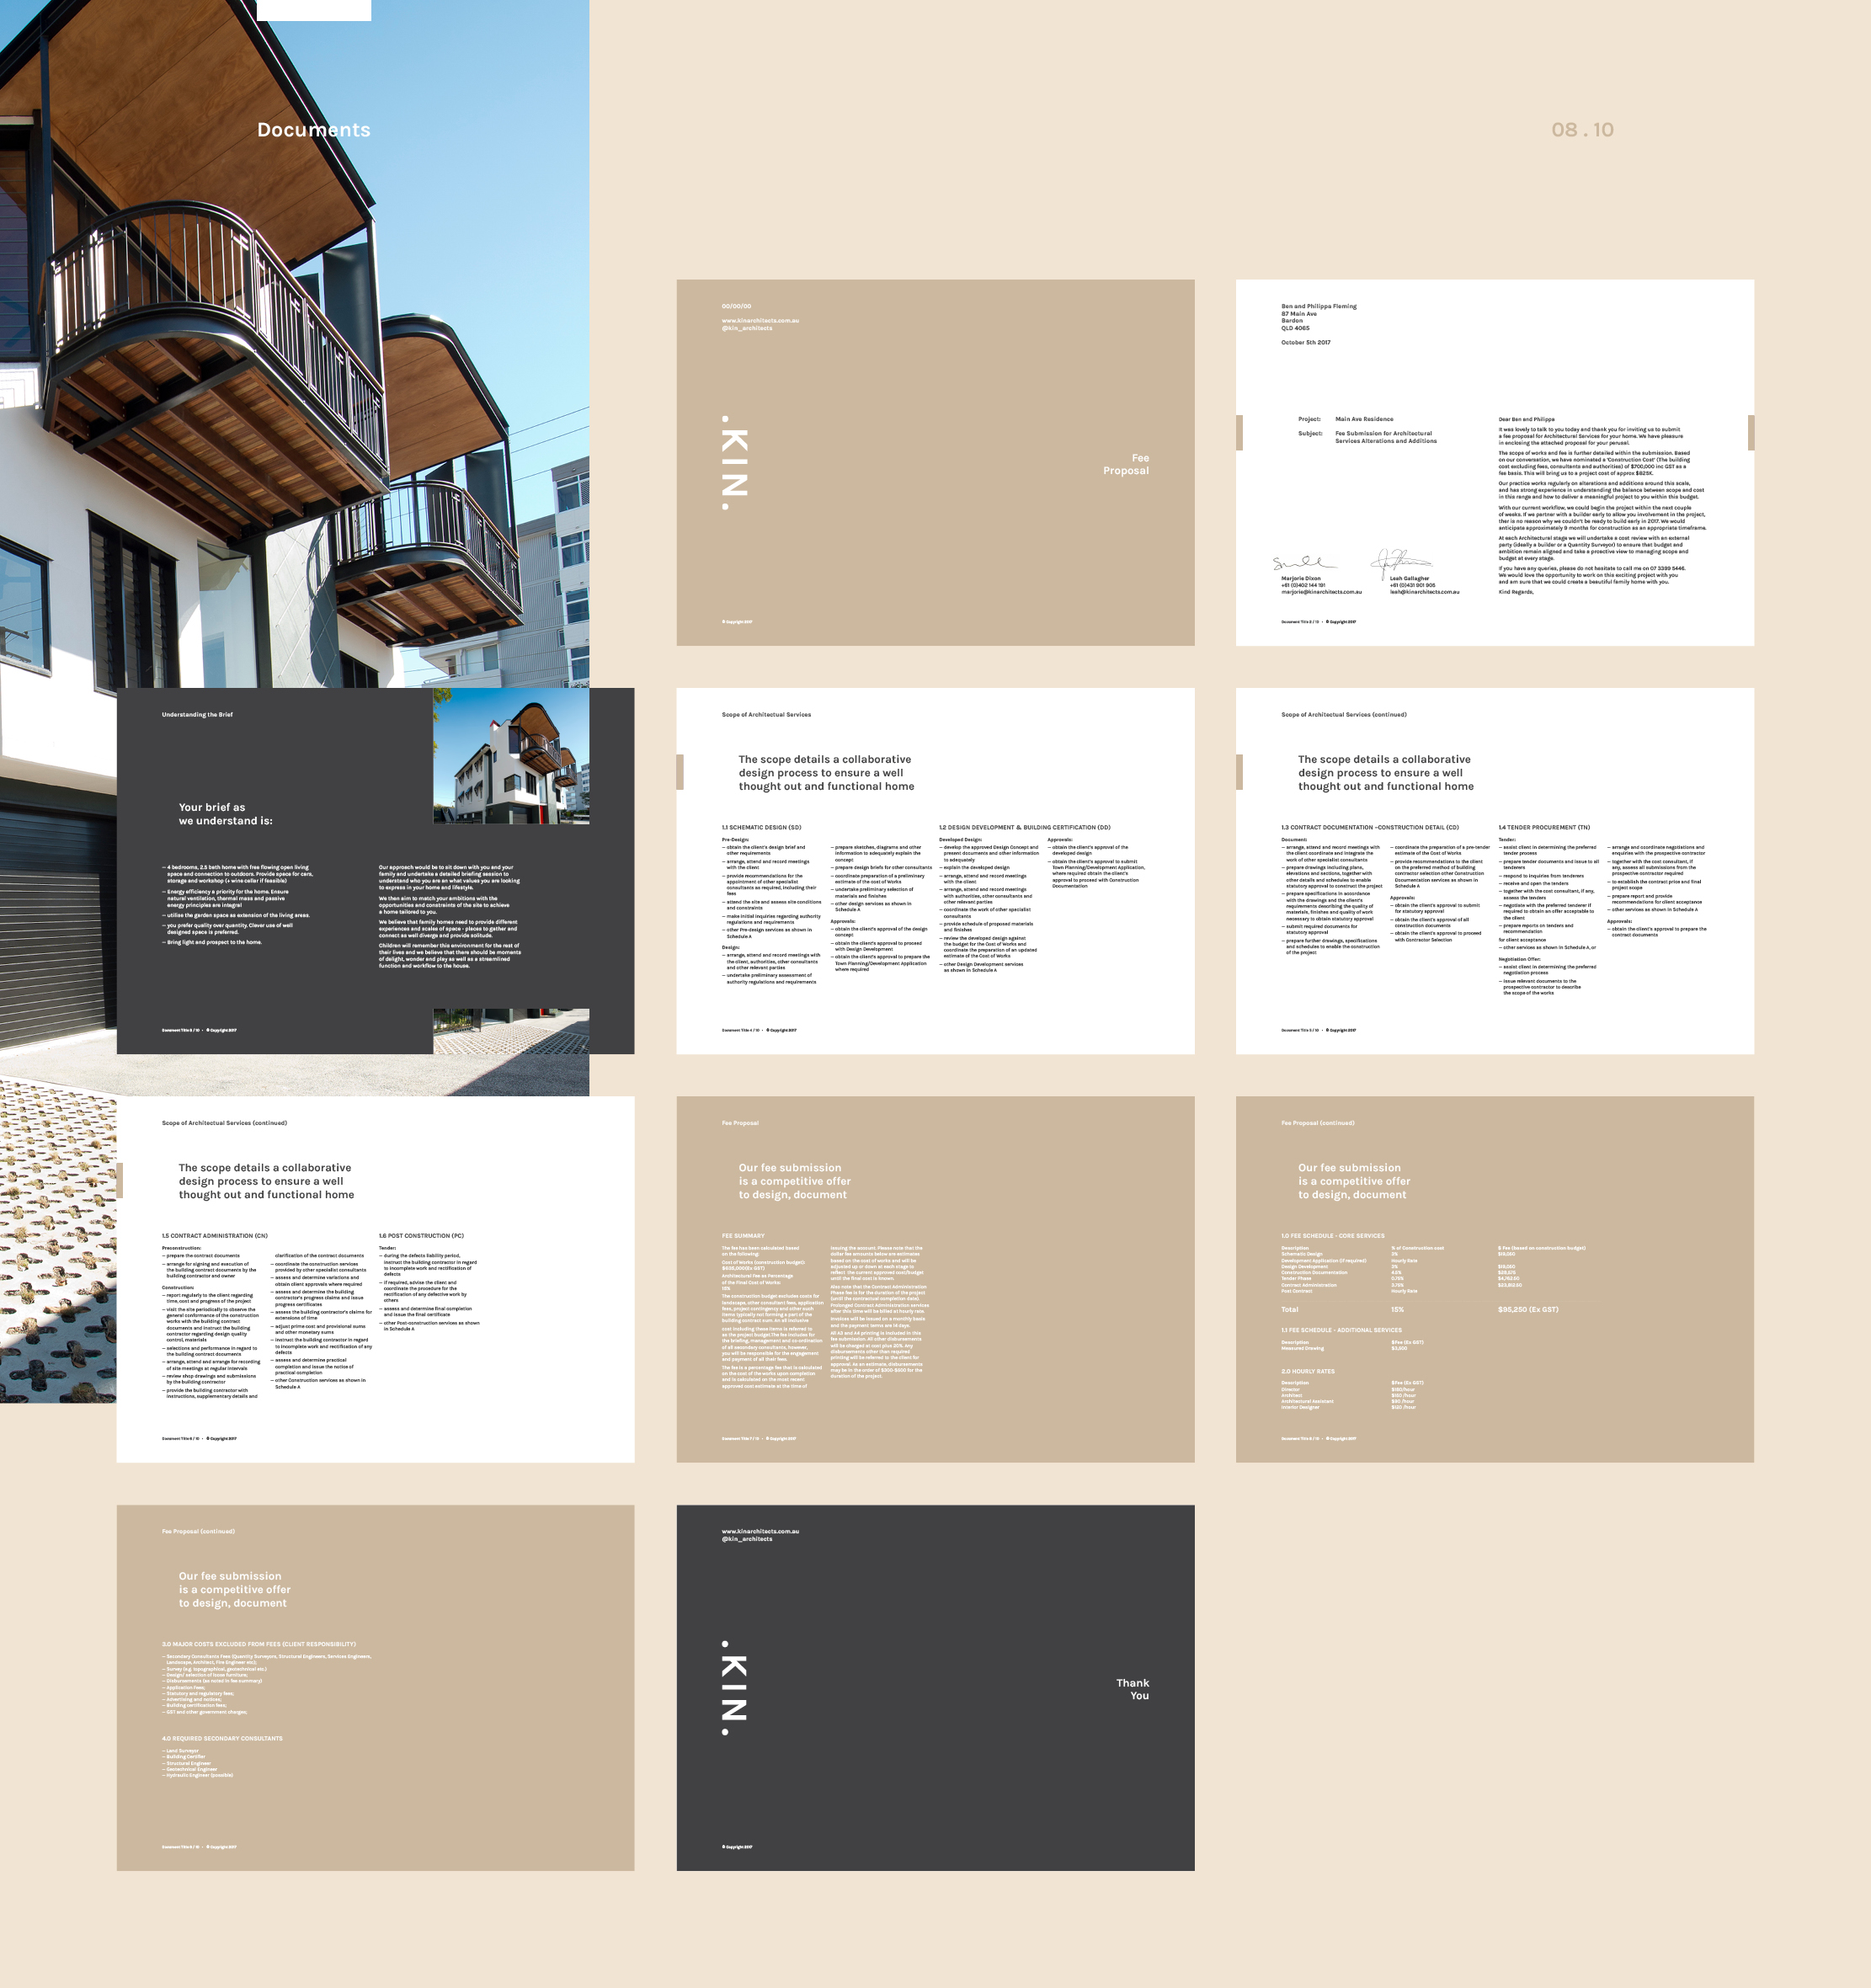 kinarchitects-project-web8.jpg